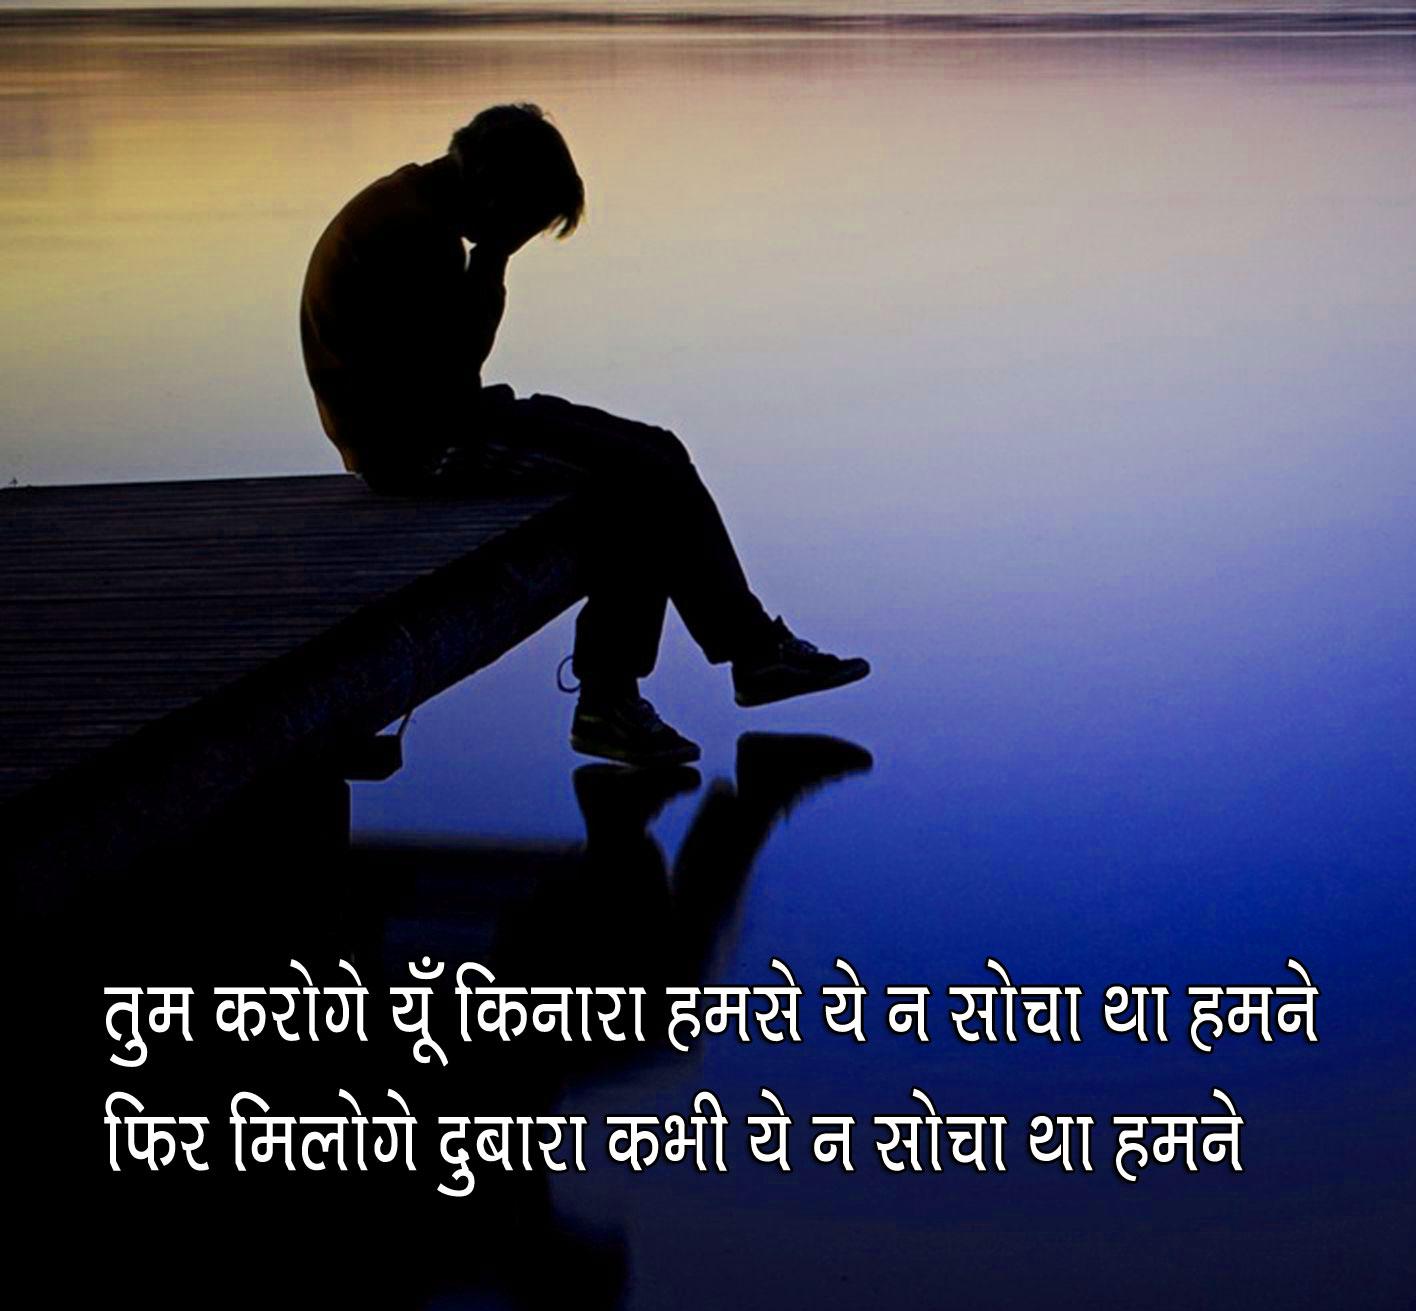 Best Hindi Shayari Images 2